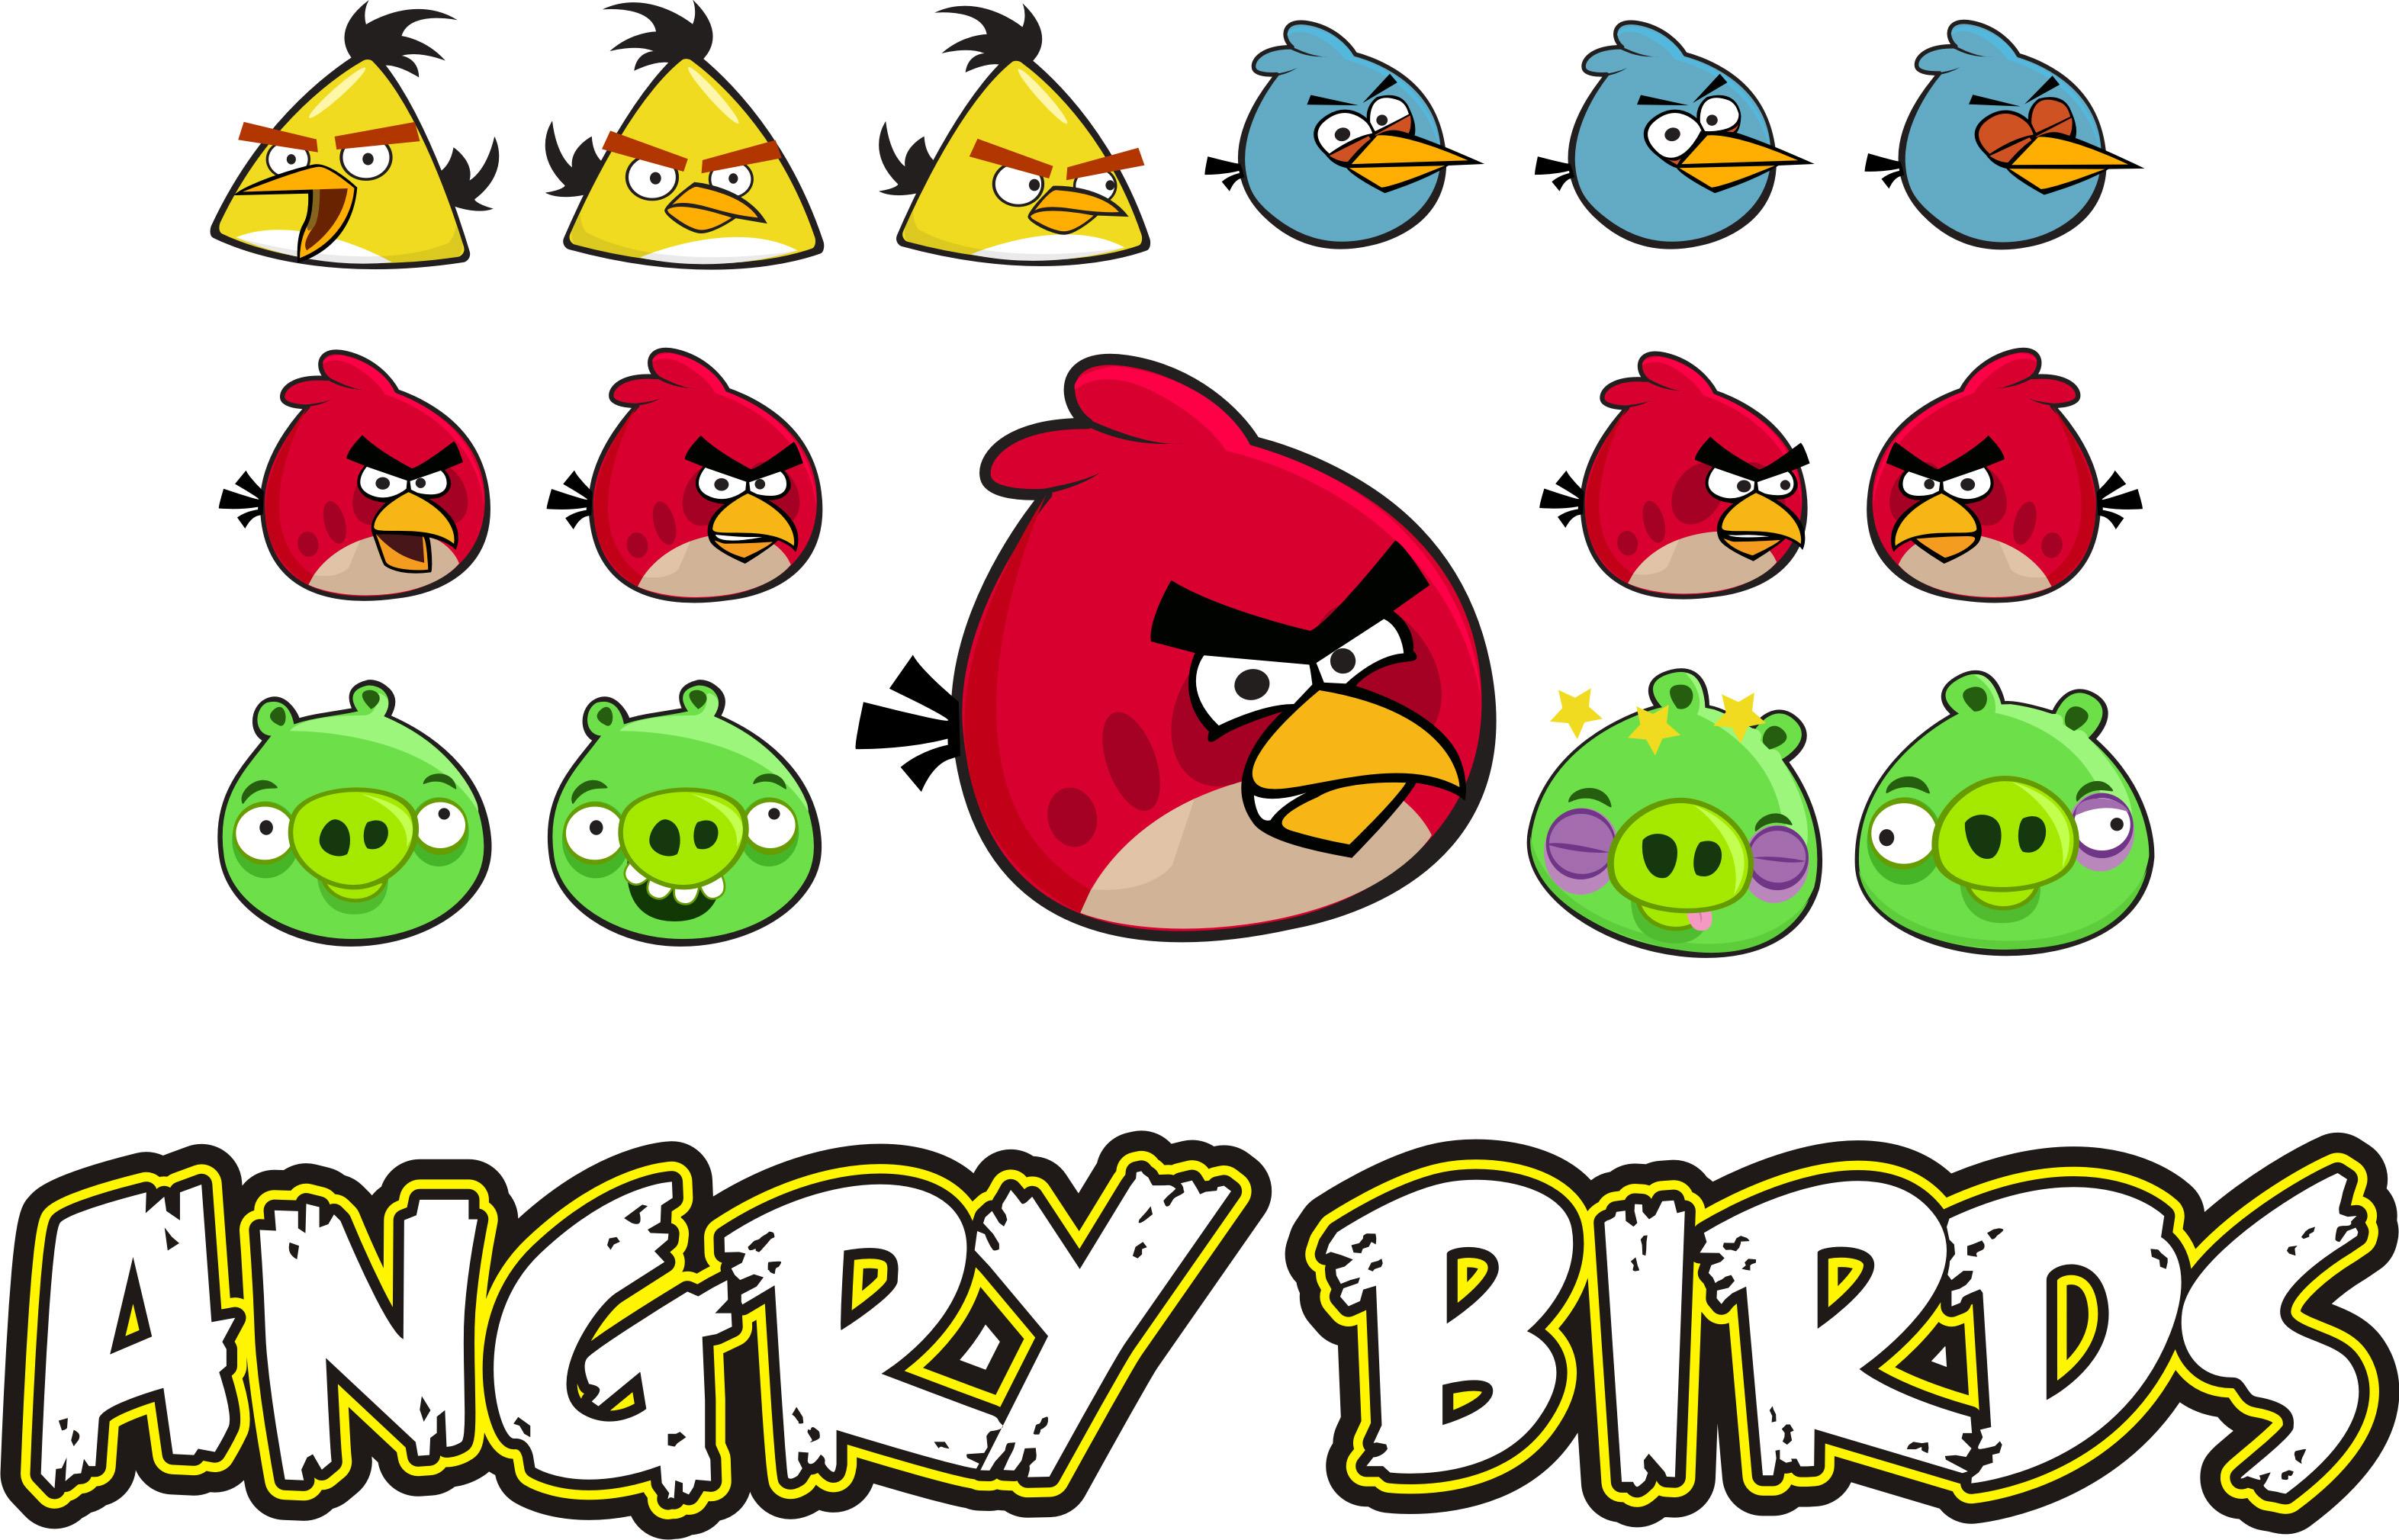 Colorido Angry Birds Personagens Vector: Corel Draw +25.000mil Imagens Vetorizadas Para Varias